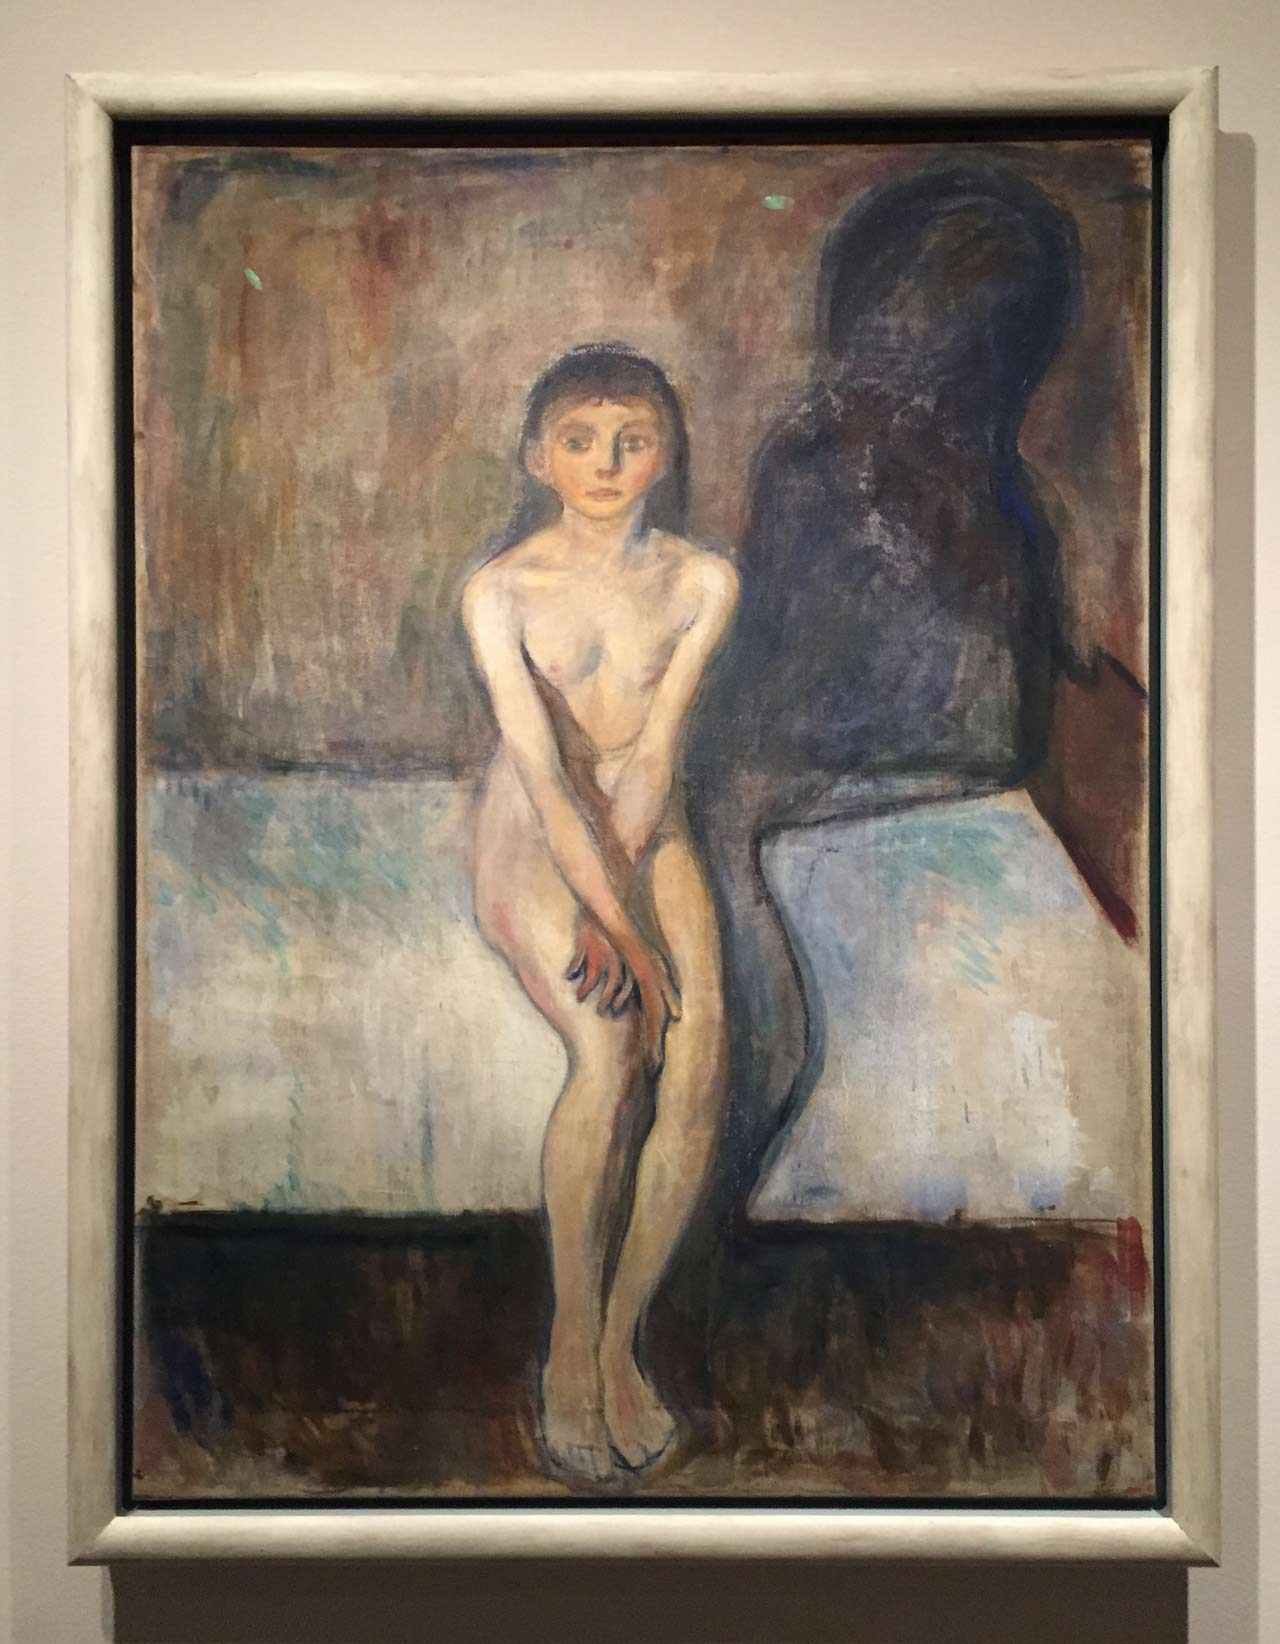 Edvard-Munch-Puberty-1894-Munch-Museum.jpg